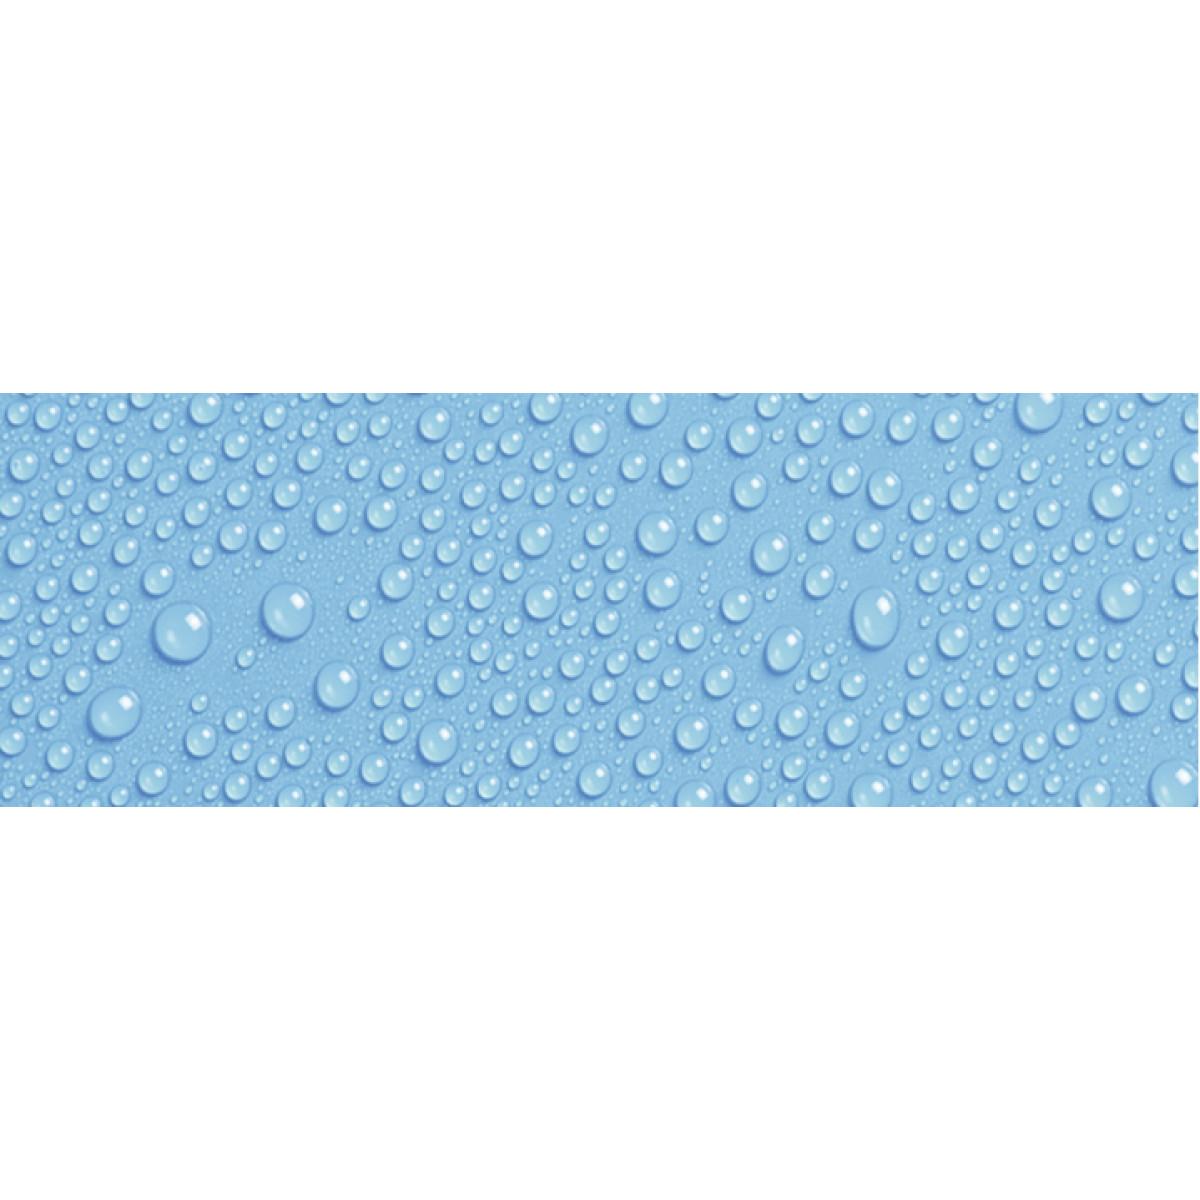 5 X Wassertropfen Fotokarton 49 68 Motiv Cm ZiPkXu